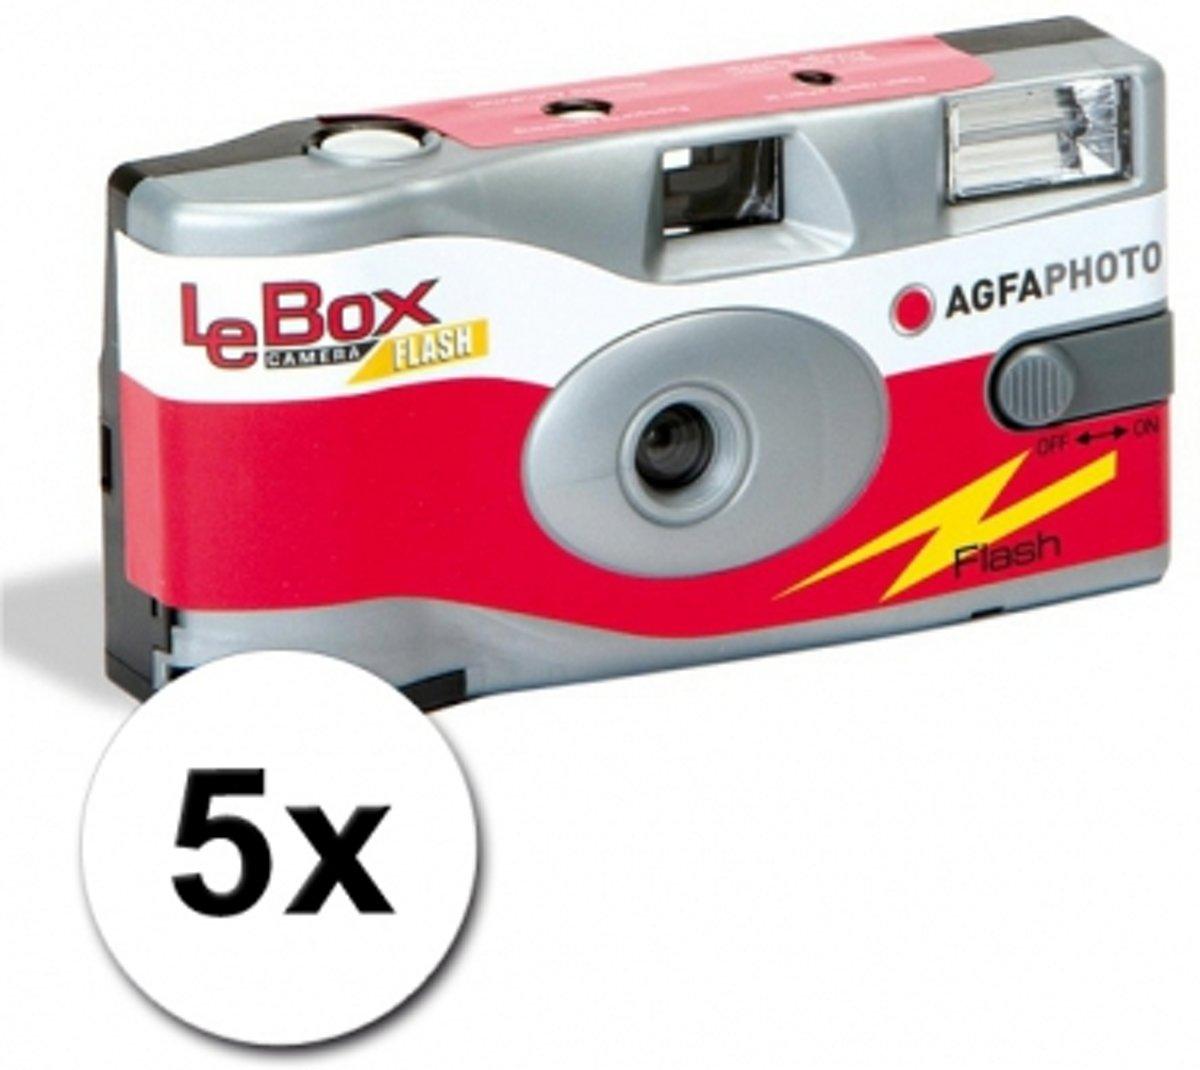 AgfaPhoto LeBox 400 27 flits - Multipack (5x) kopen